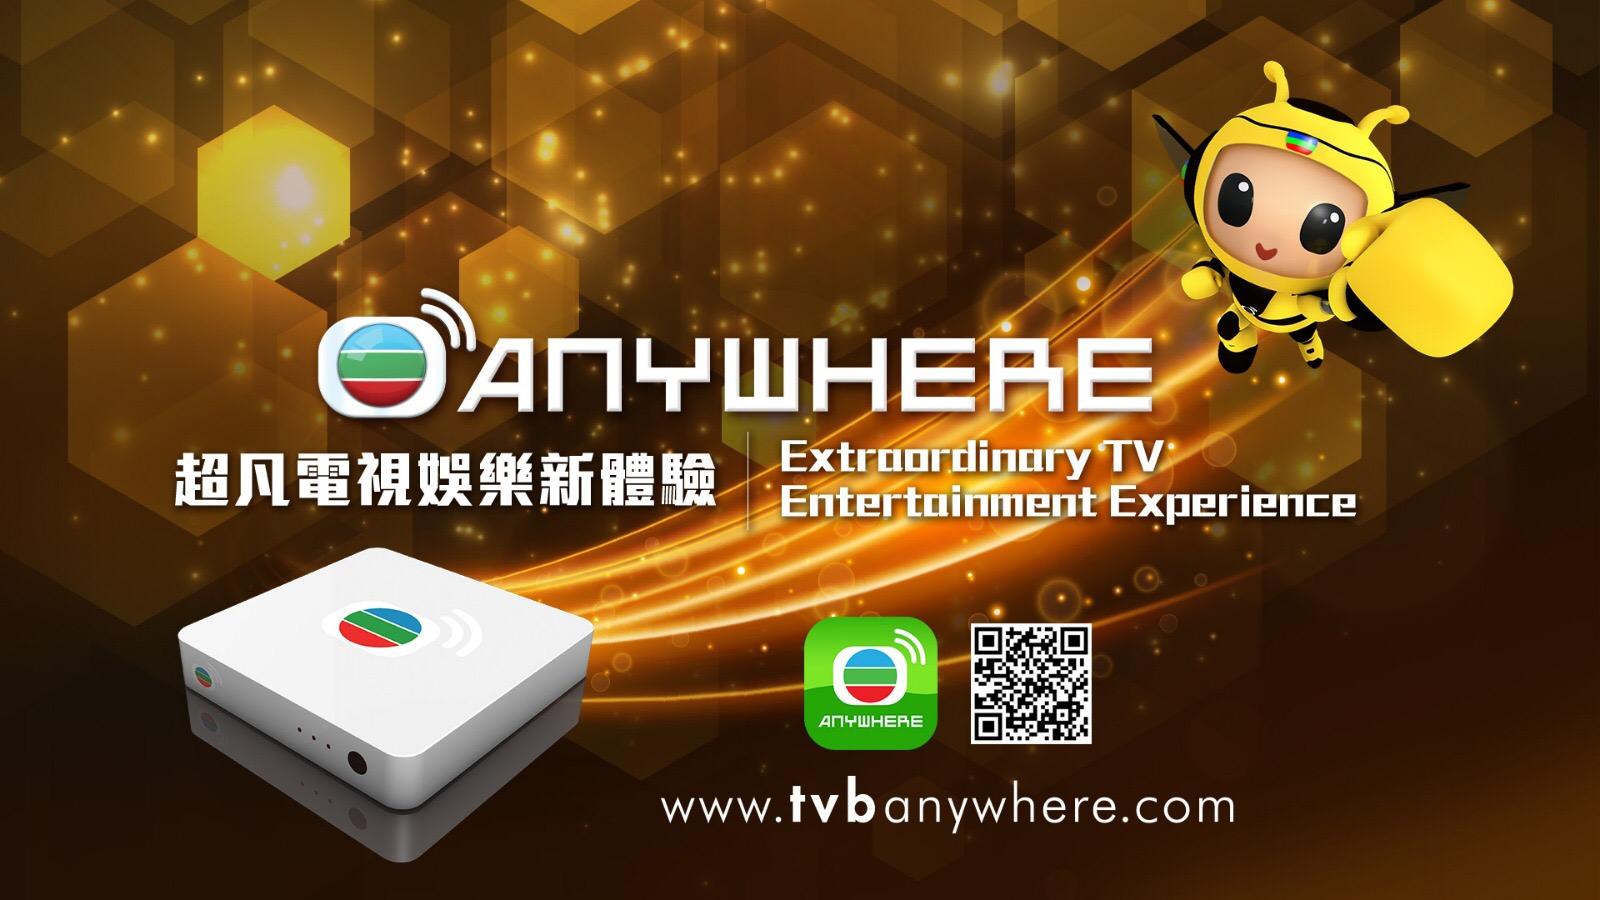 TVB Anywhere serves global audience